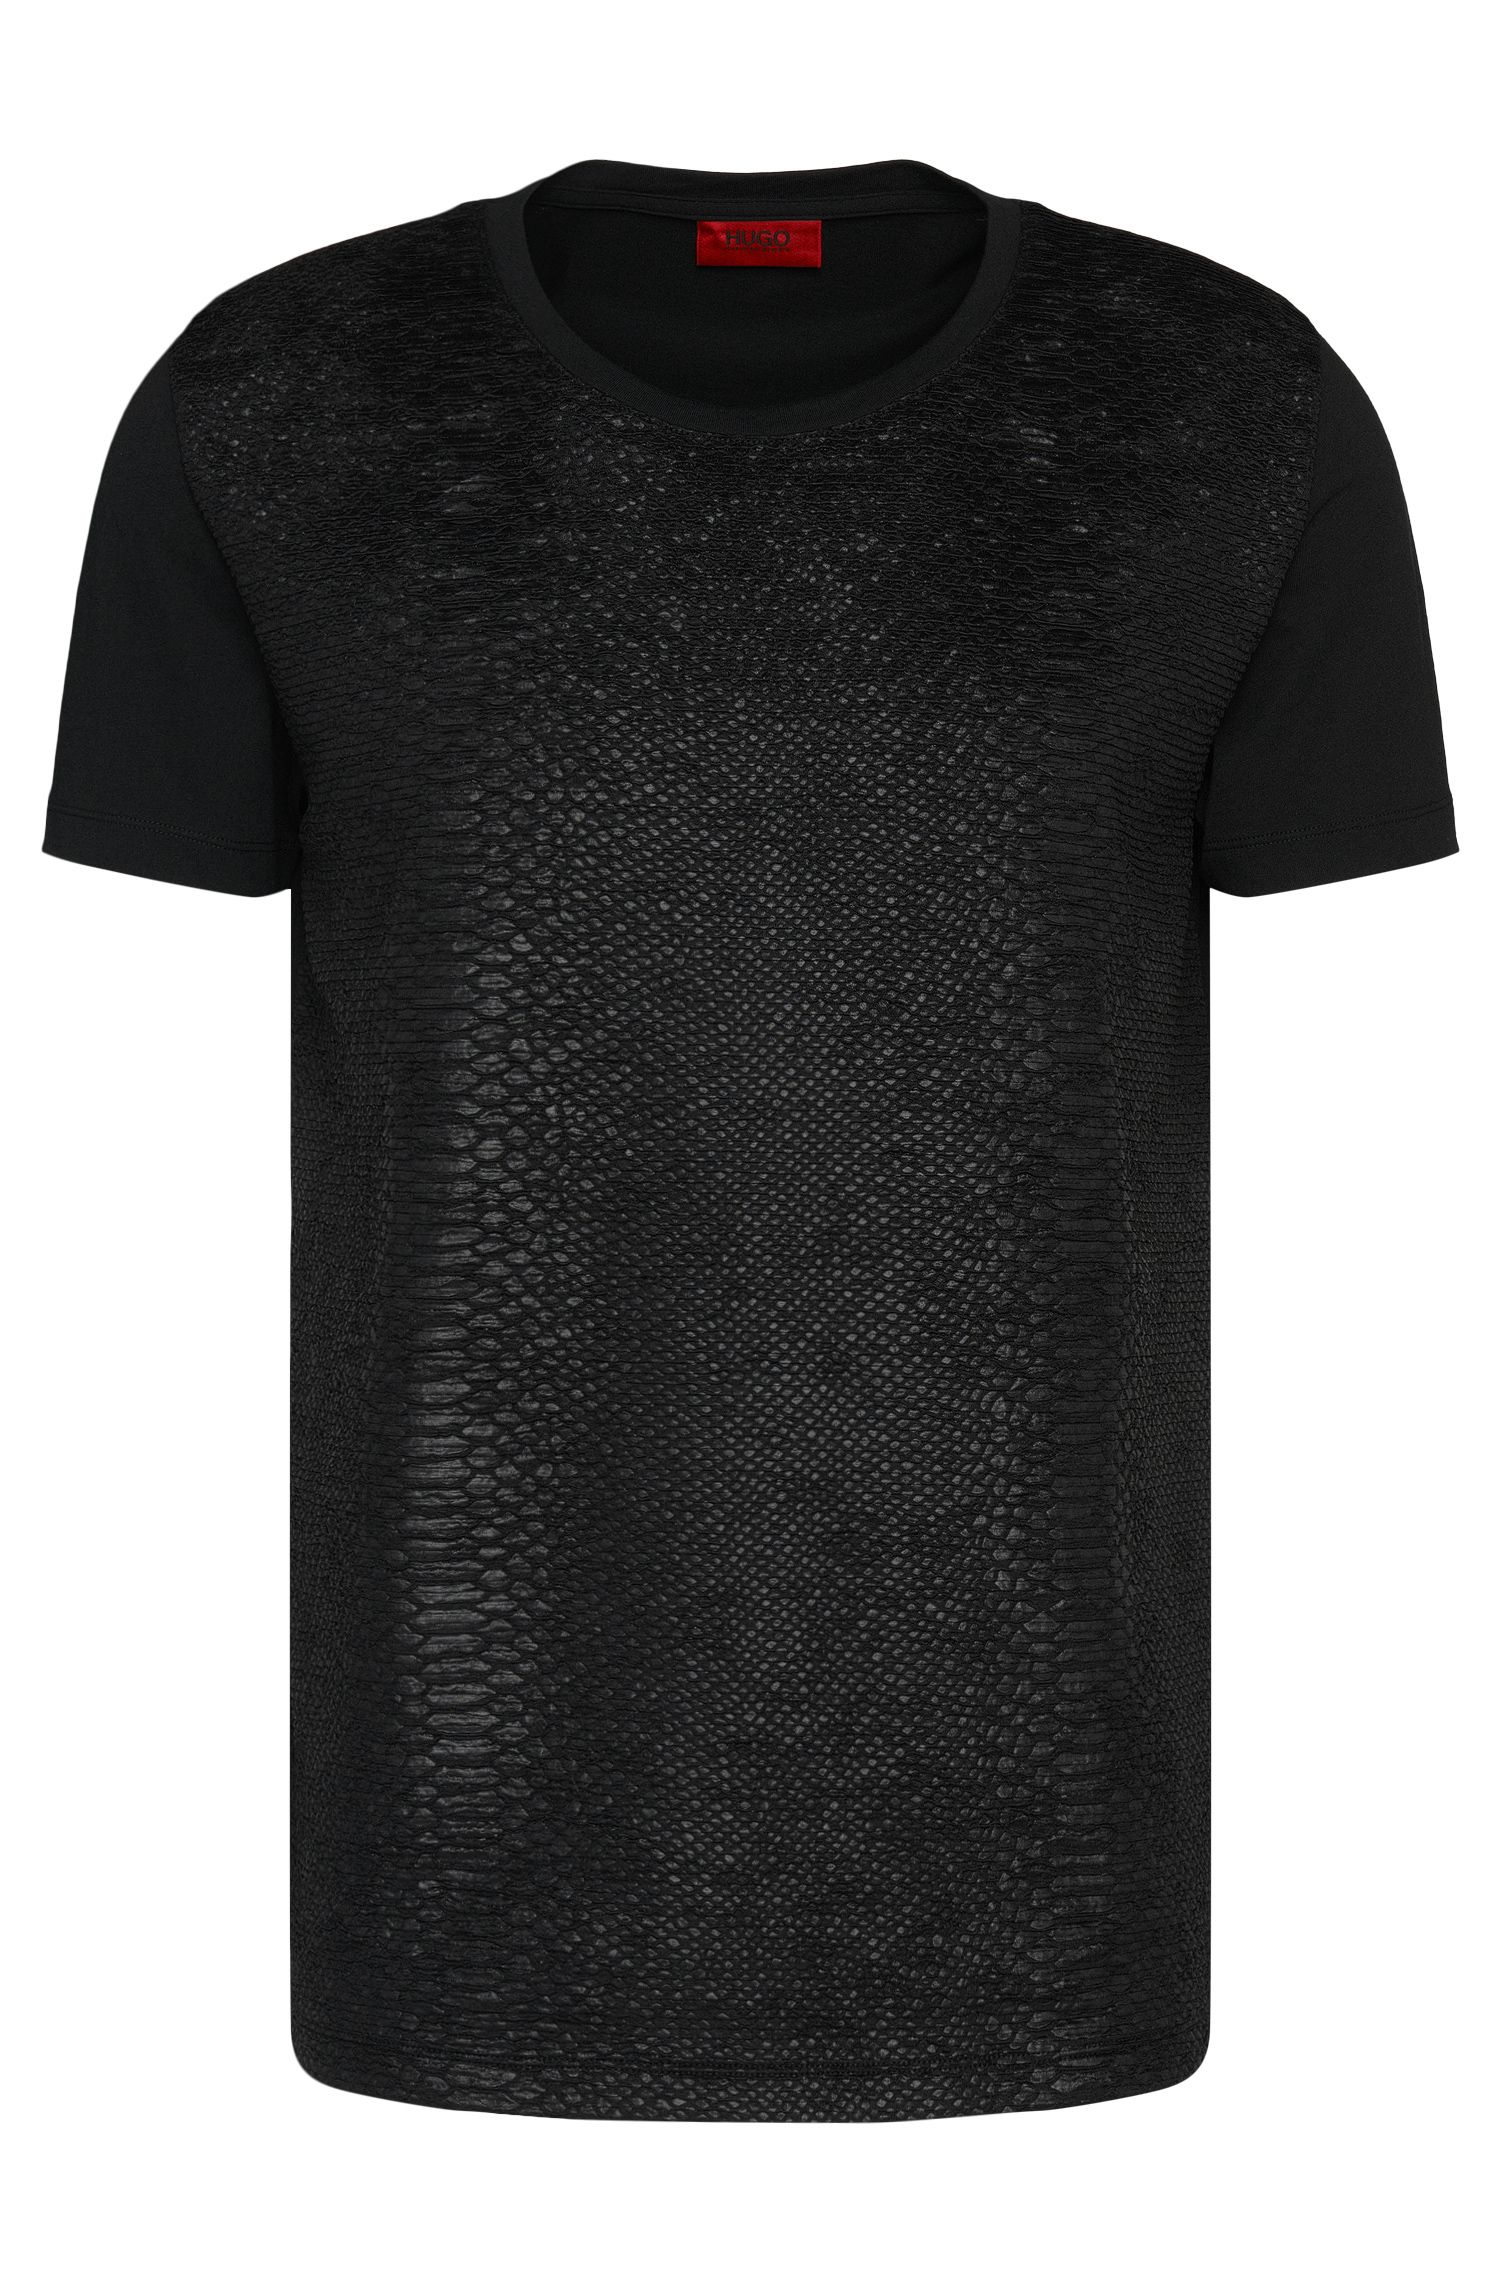 'Desert' | Cotton Snakeskin Textured T-Shirt